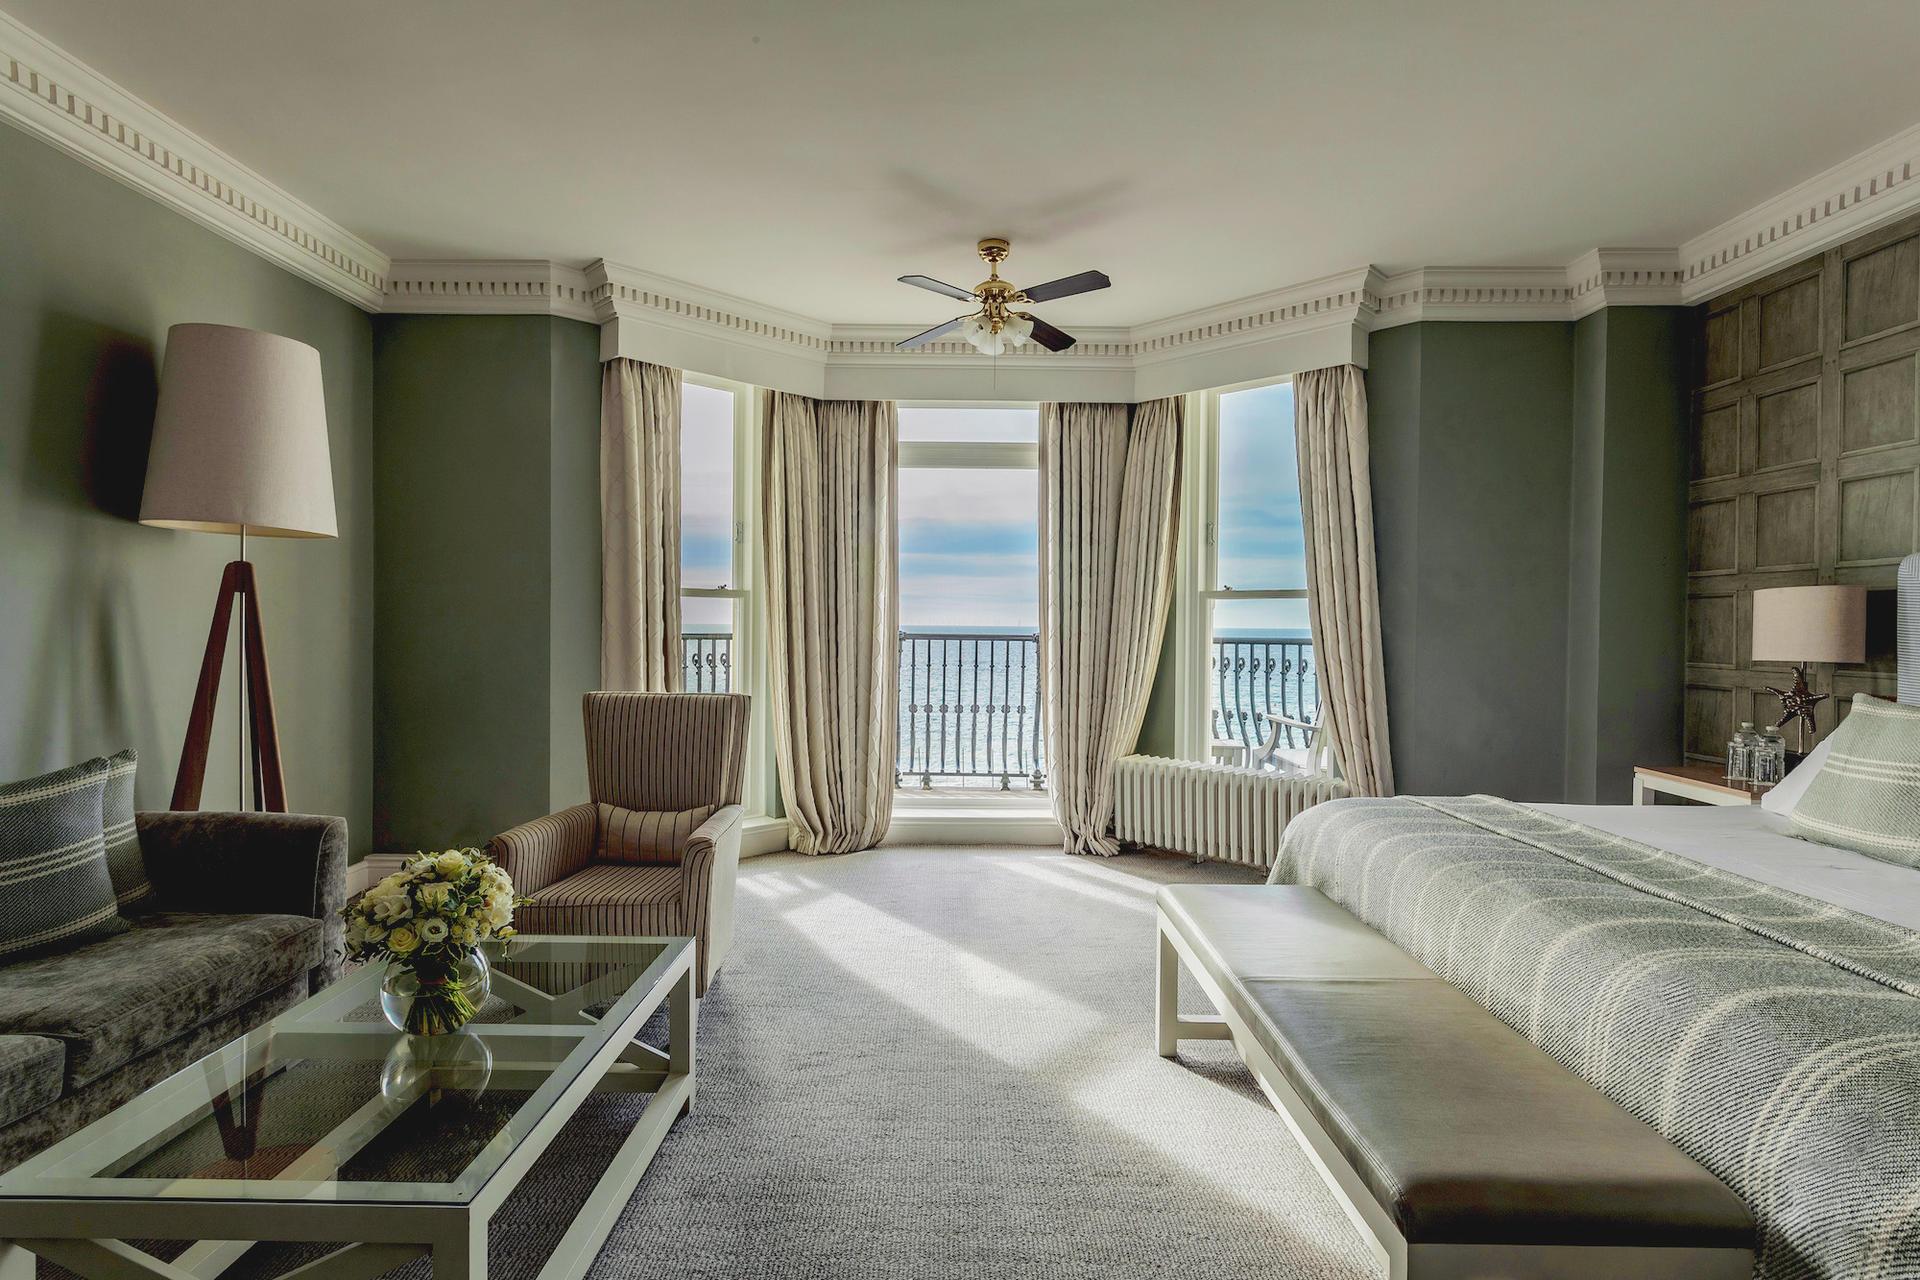 Accommodation at The Grand Brighton